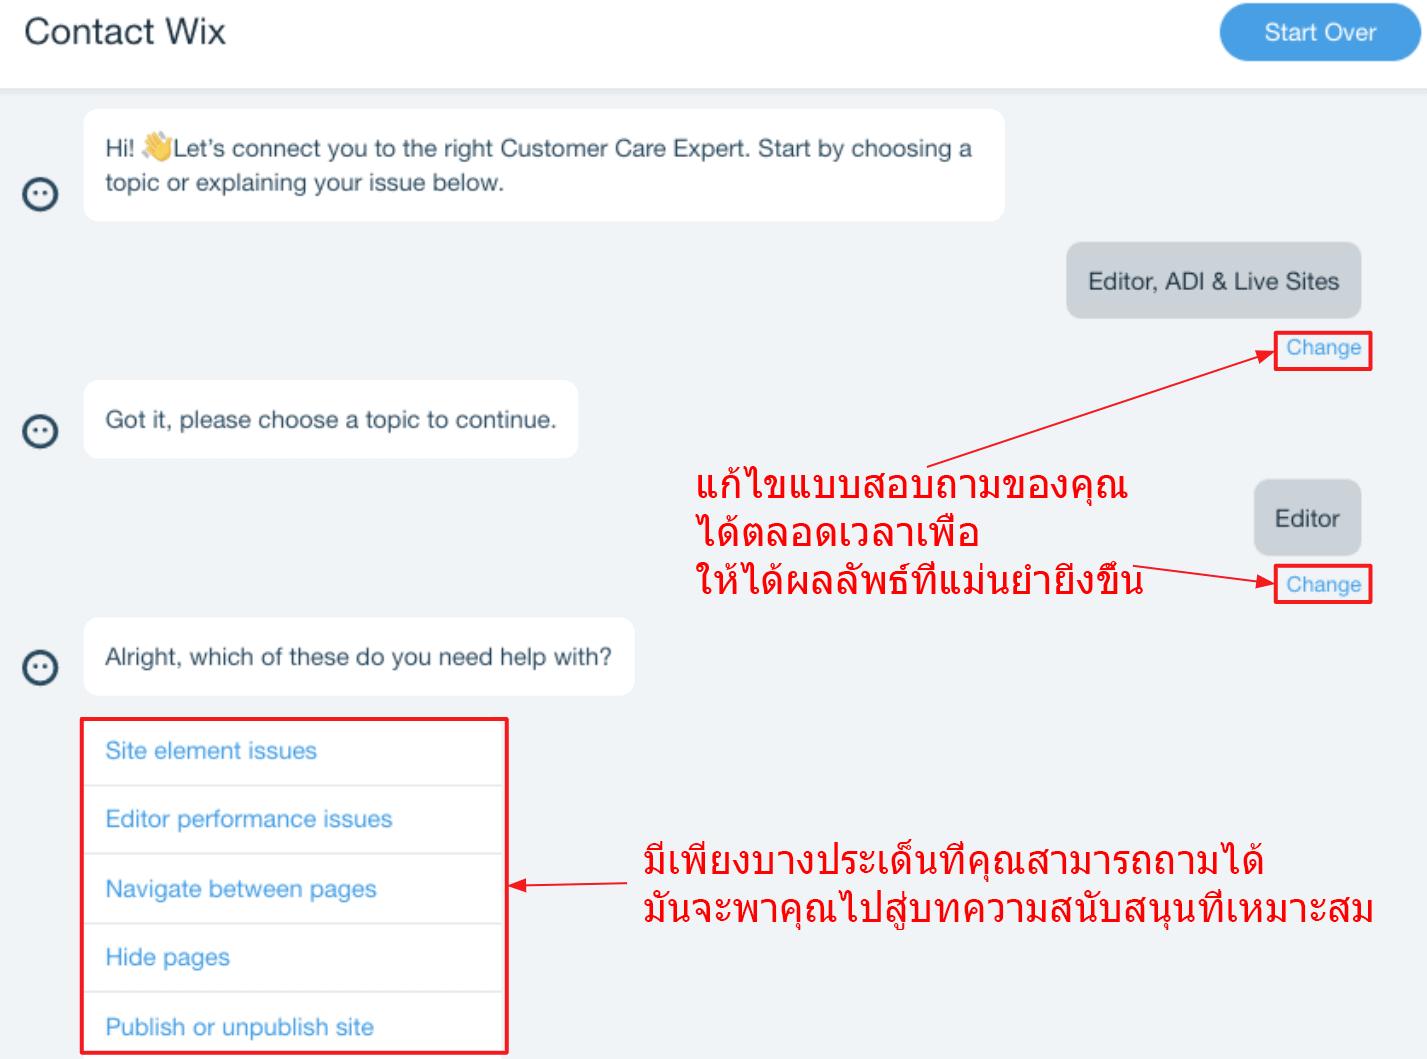 Support chatbot Wix_thai